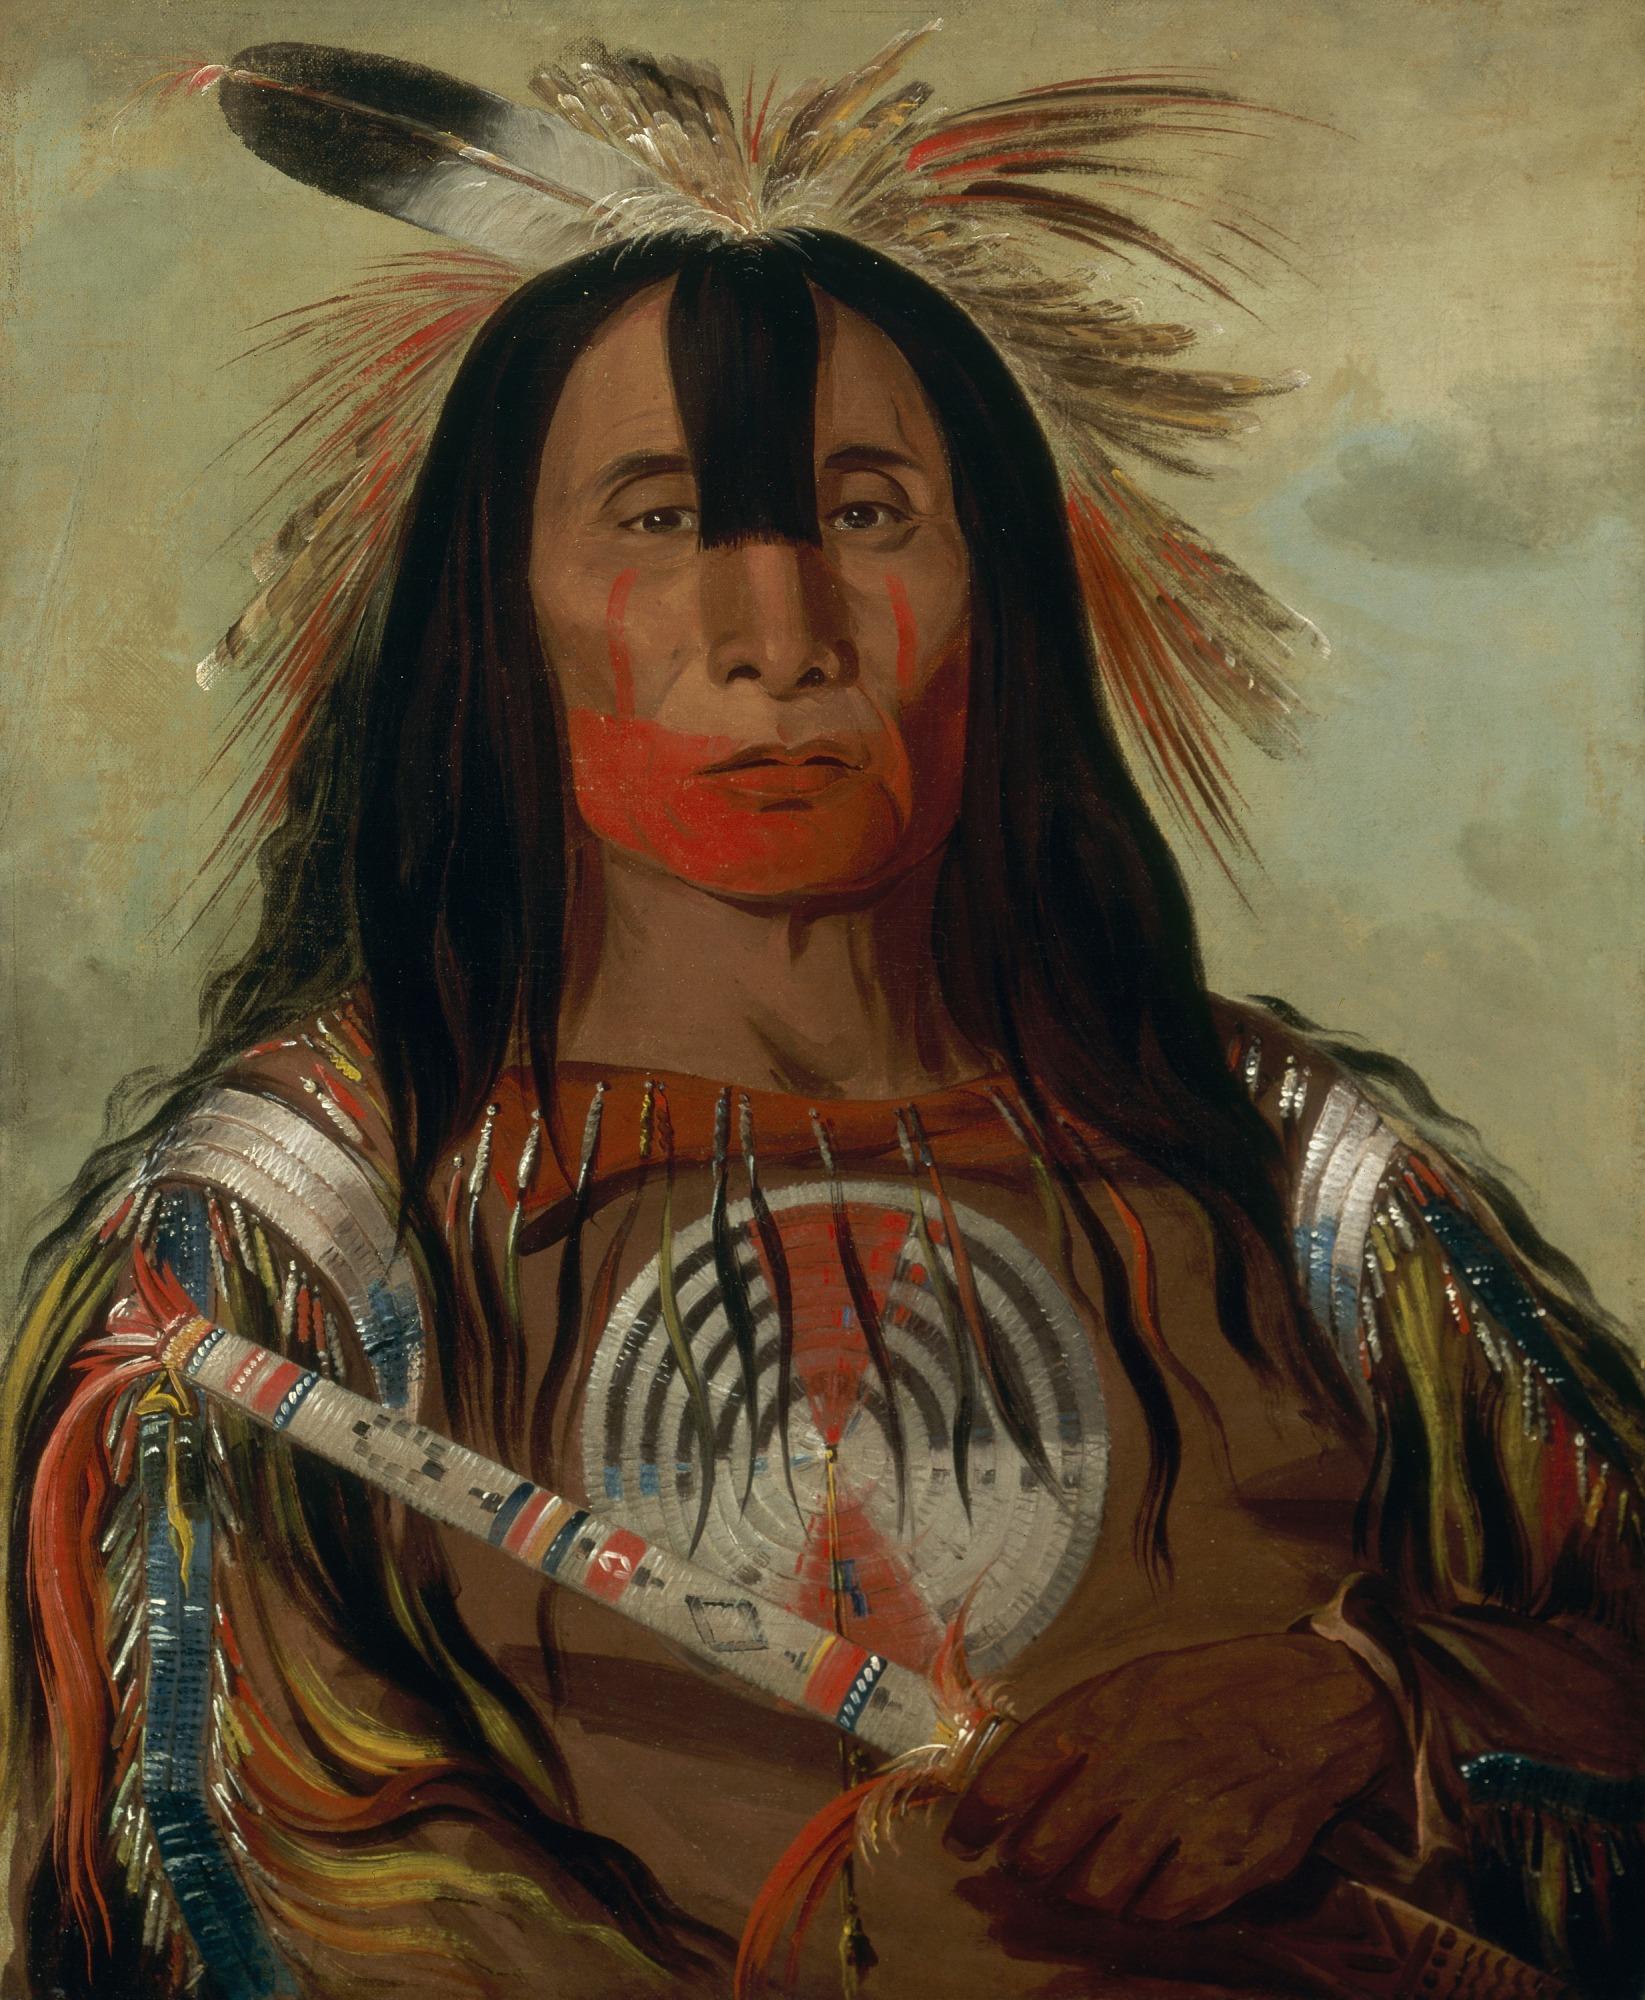 images for Stu-mick-o-súcks, Buffalo Bull's Back Fat, Head Chief, Blood Tribe